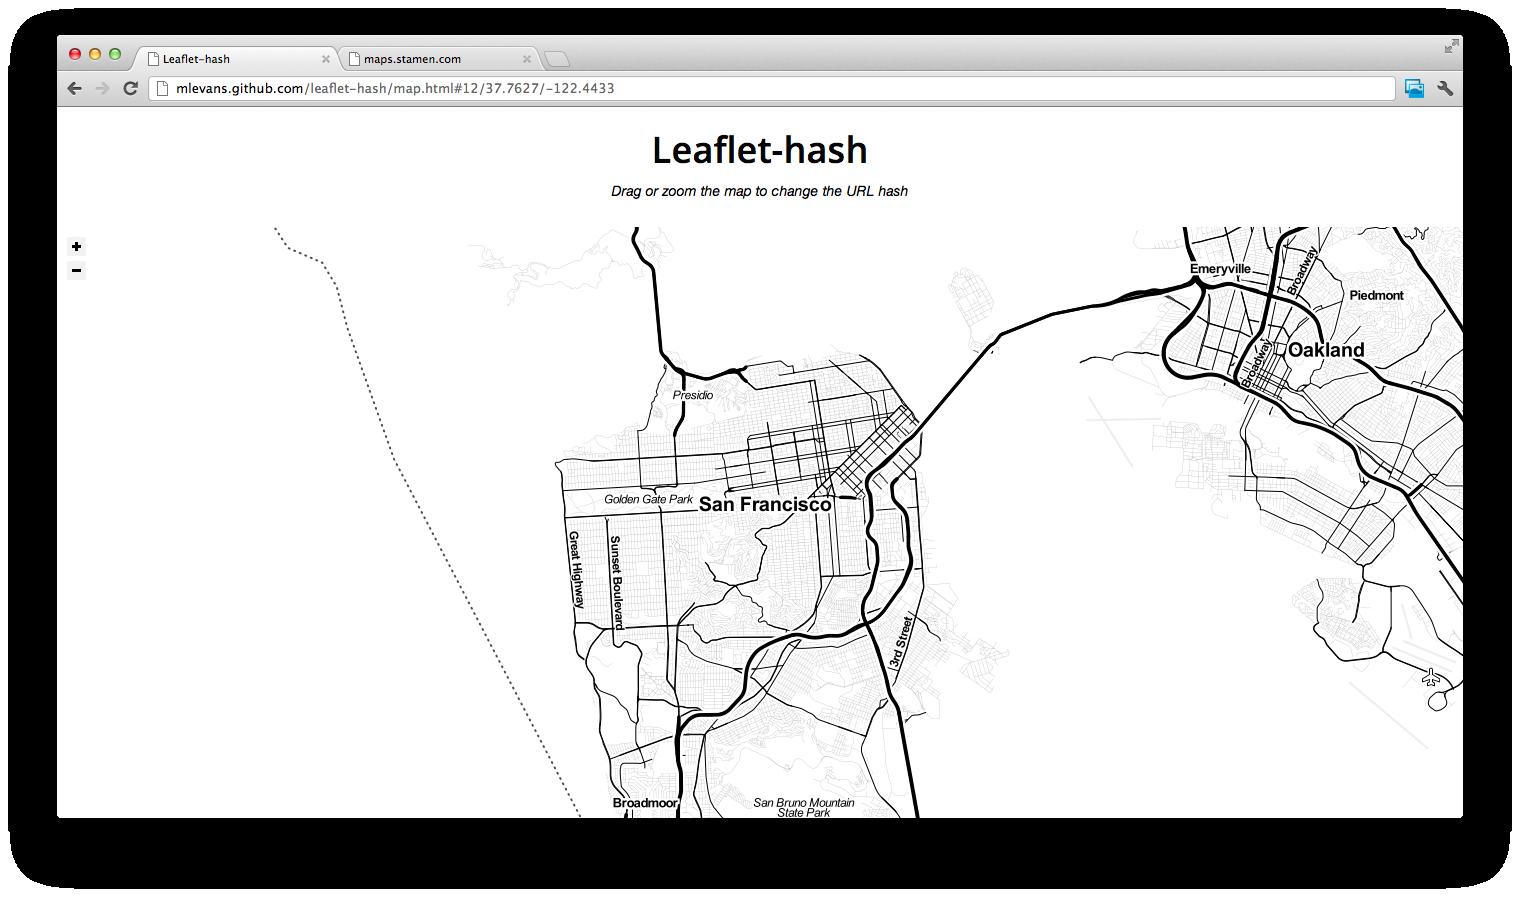 Leaflet-hash